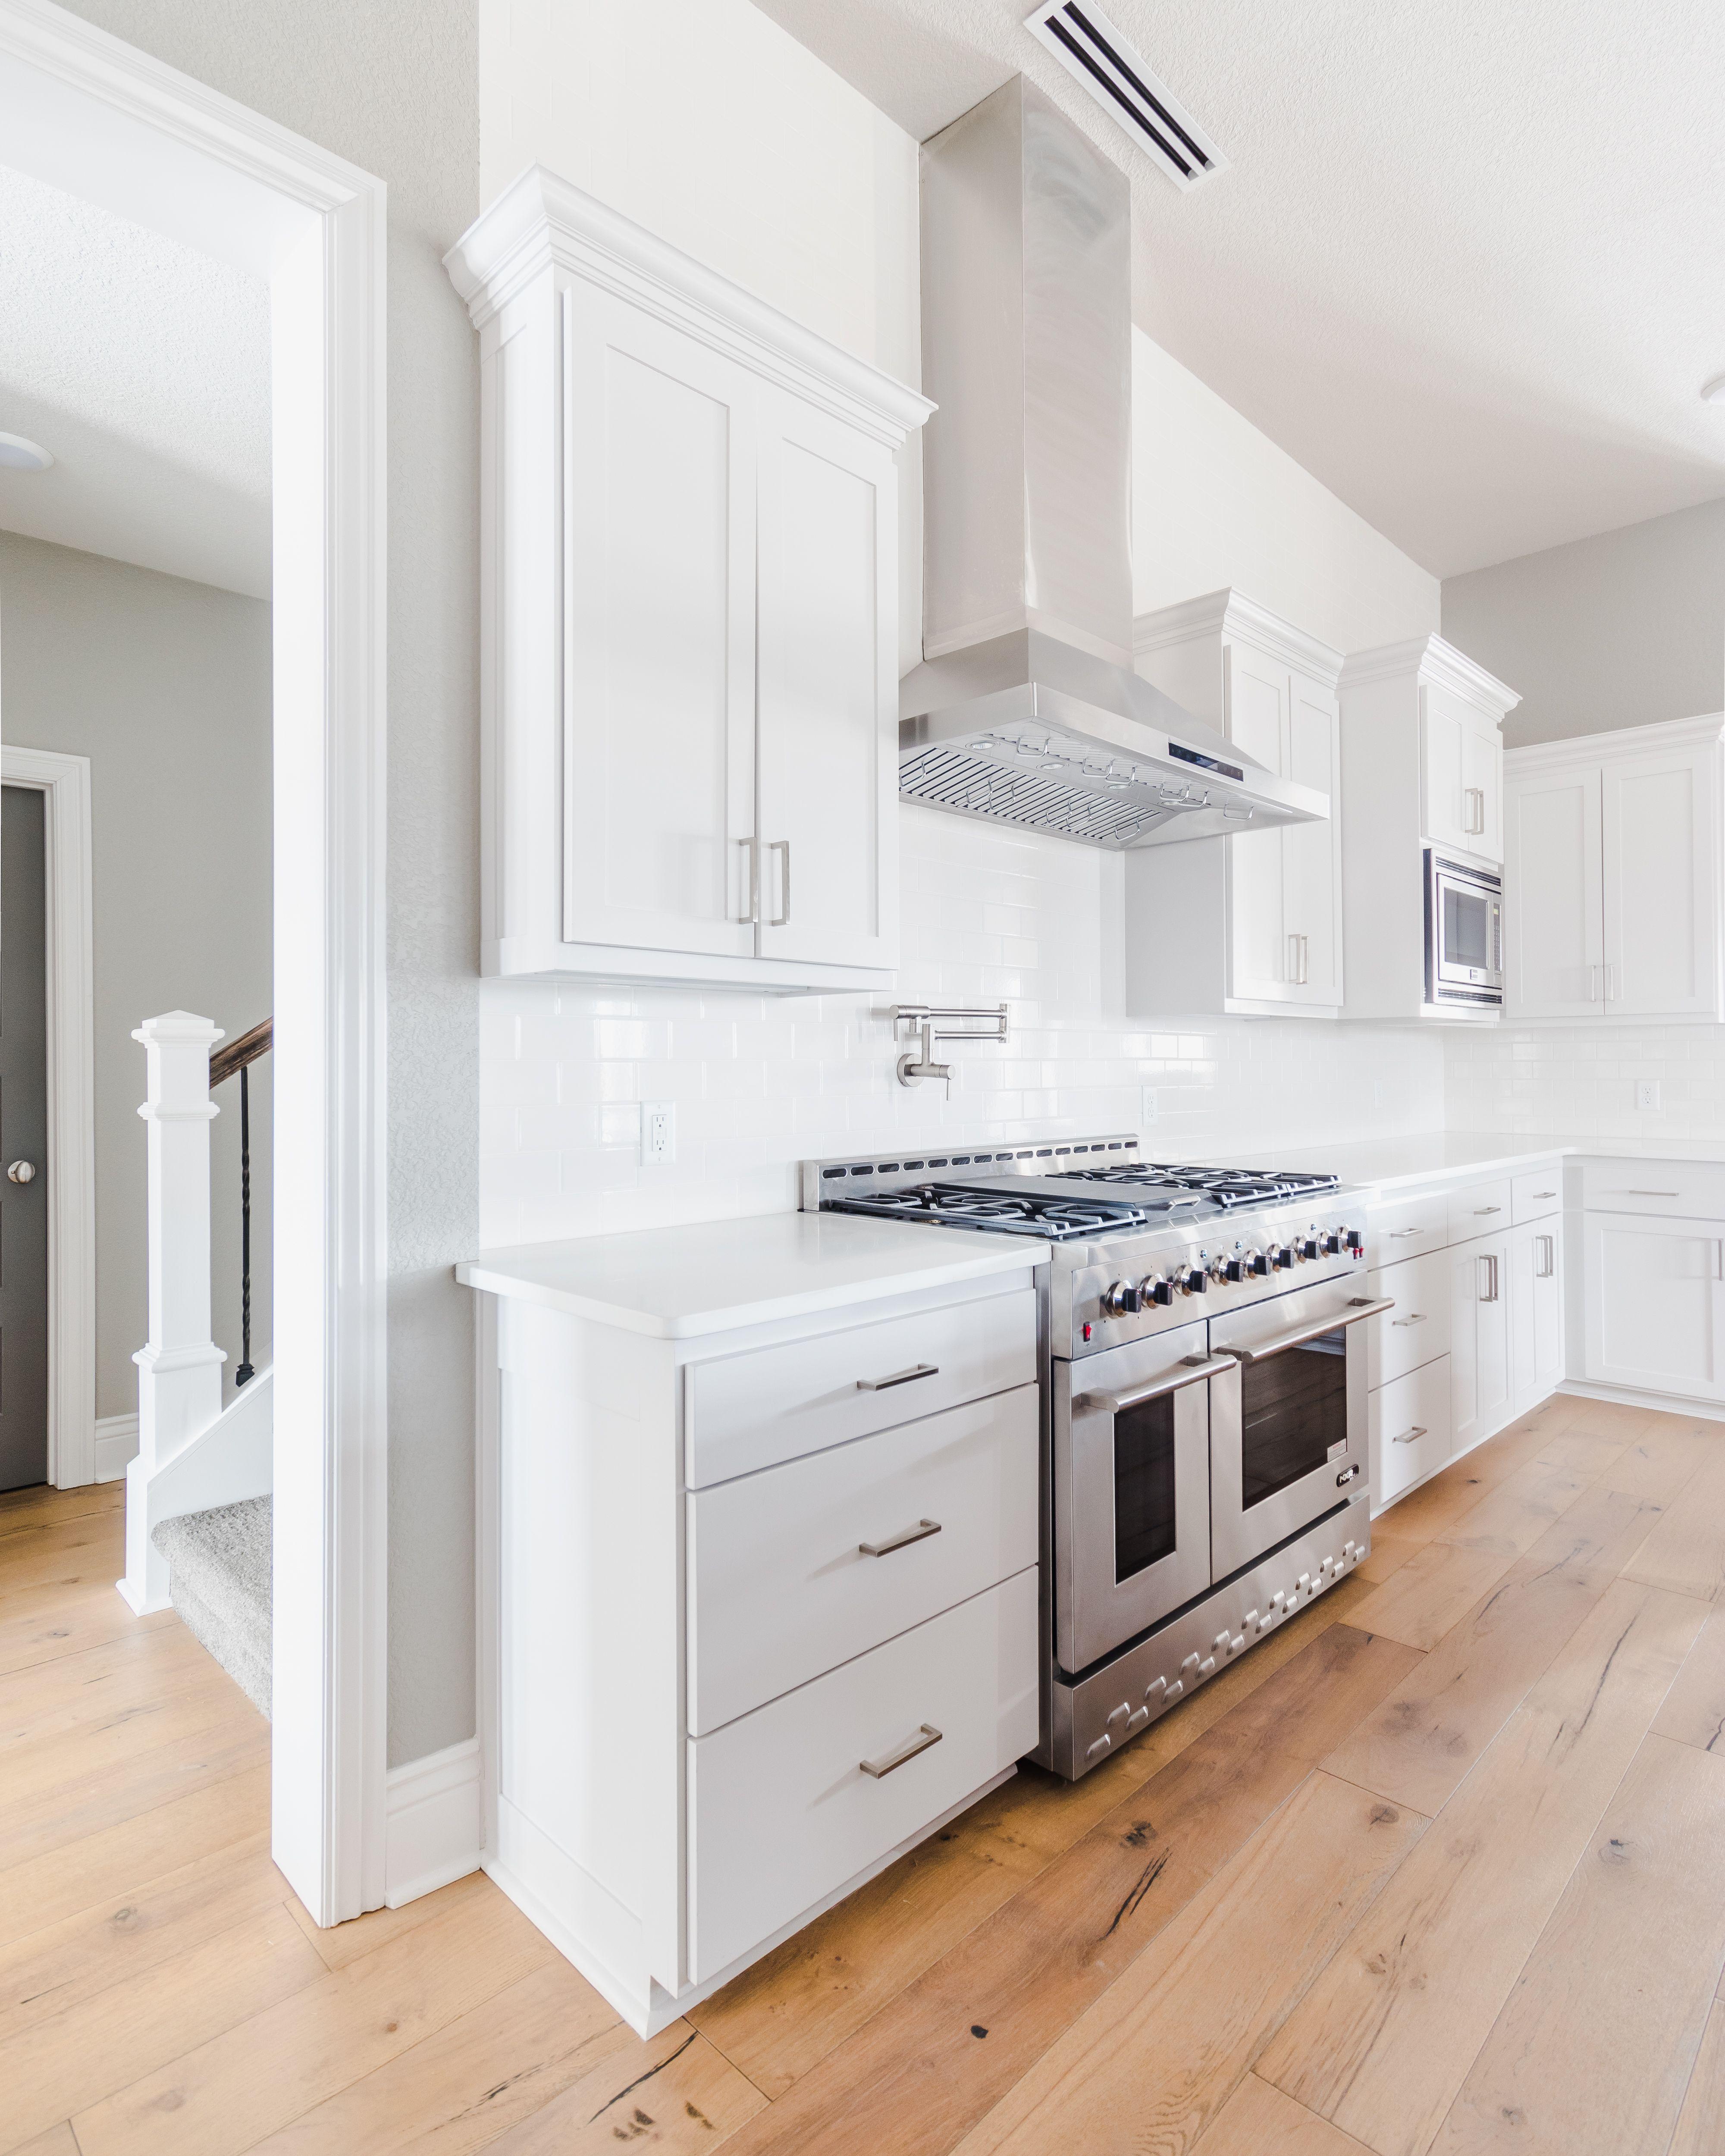 Modern White Kitchen W Shaker Cabinets White Subway Tile